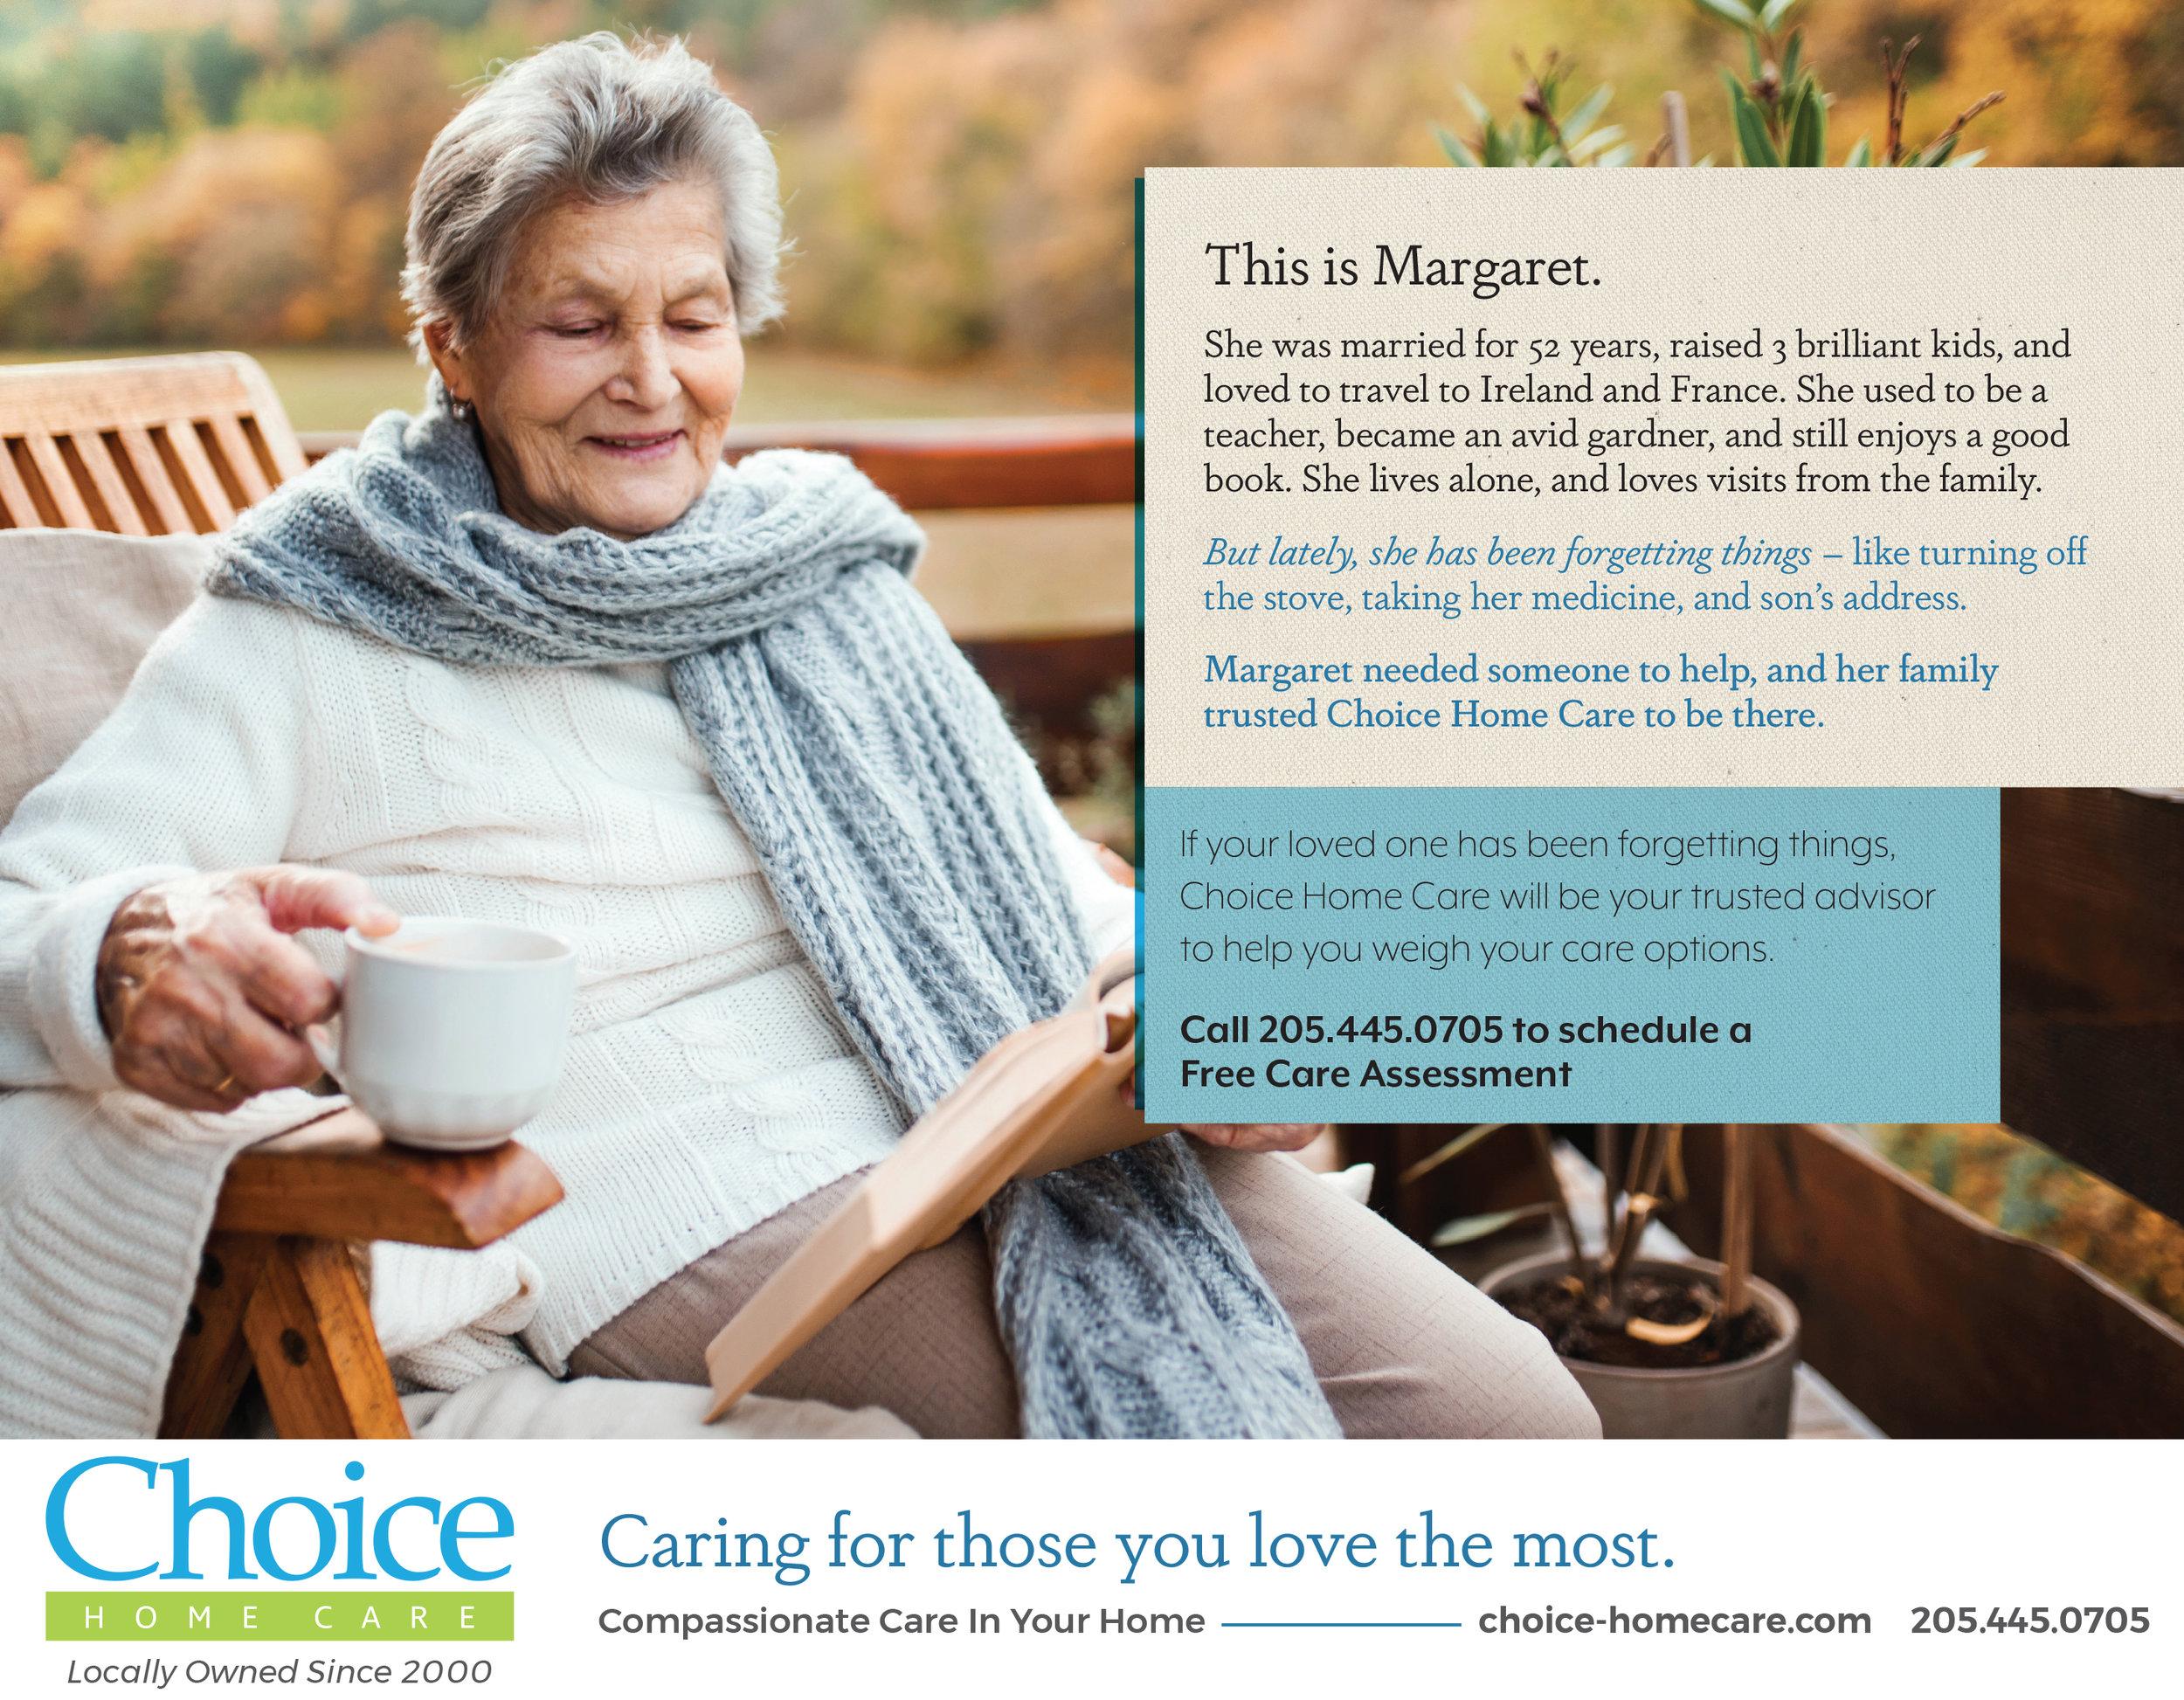 Choice Home Care_9.75x7.59  _0119 _ Memory.jpg